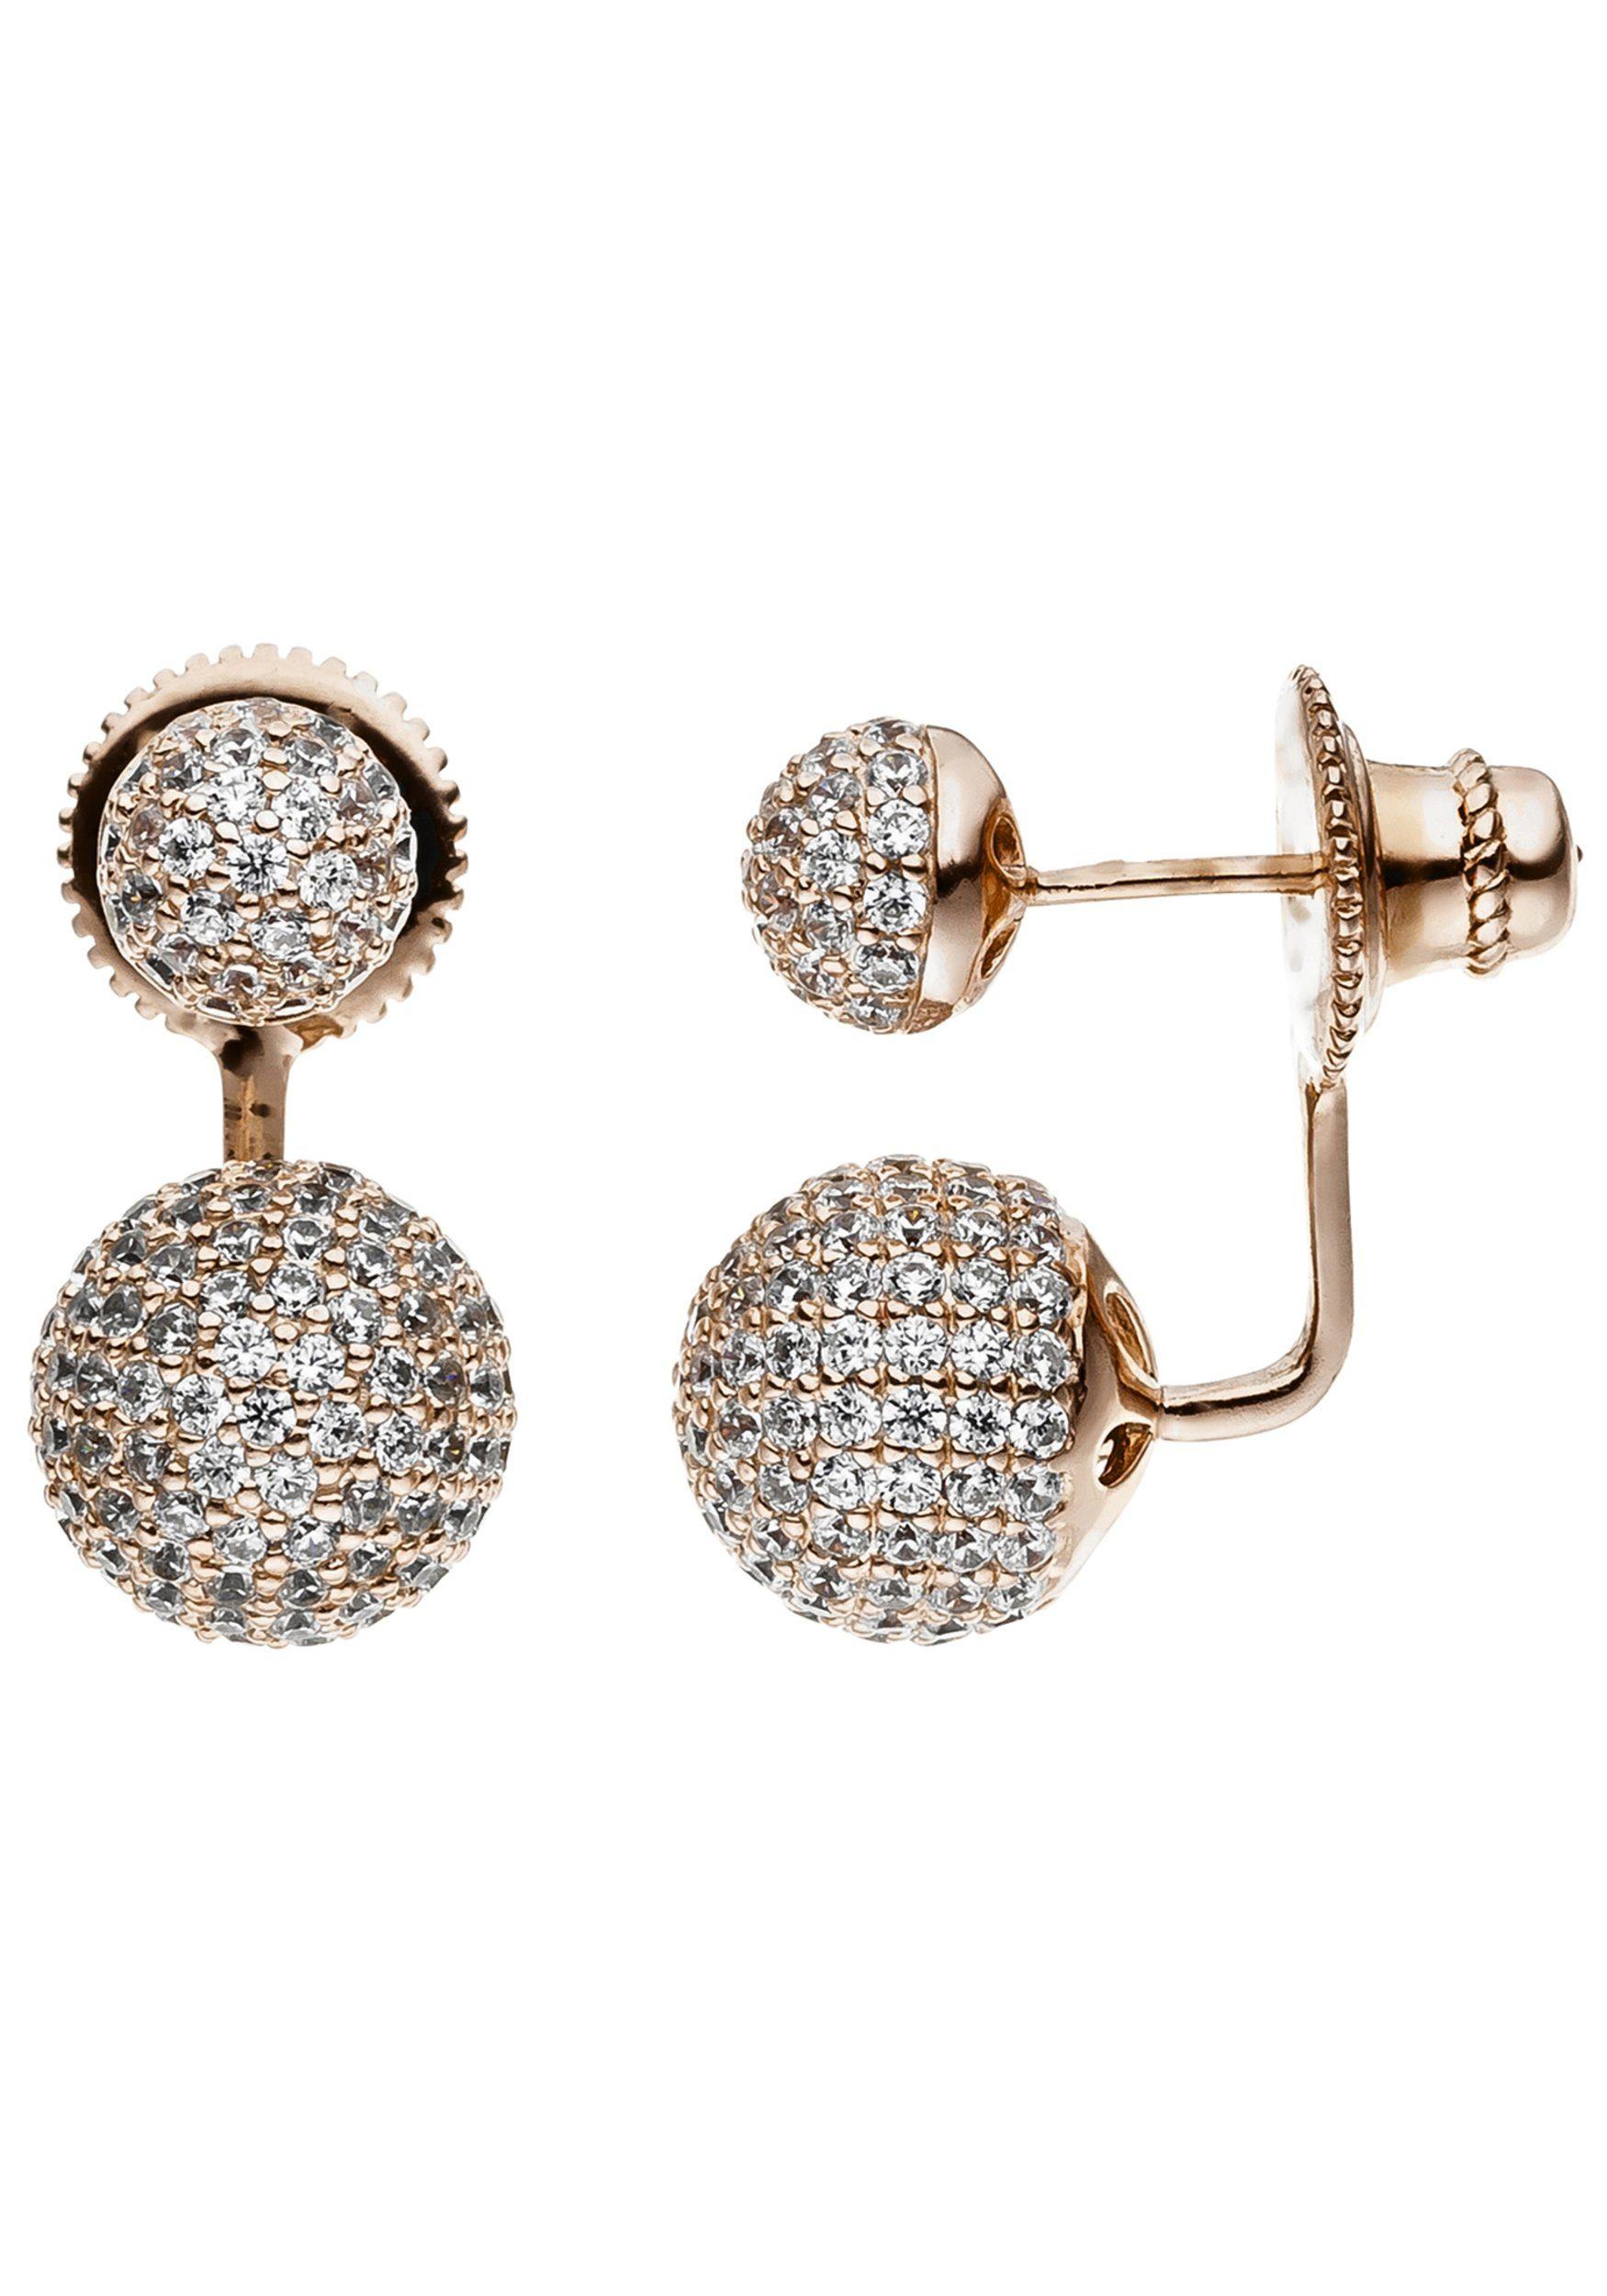 JOBO Paar Ohrstecker »Kugeln« 925 Silber roségold vergoldet mit Zirkonia